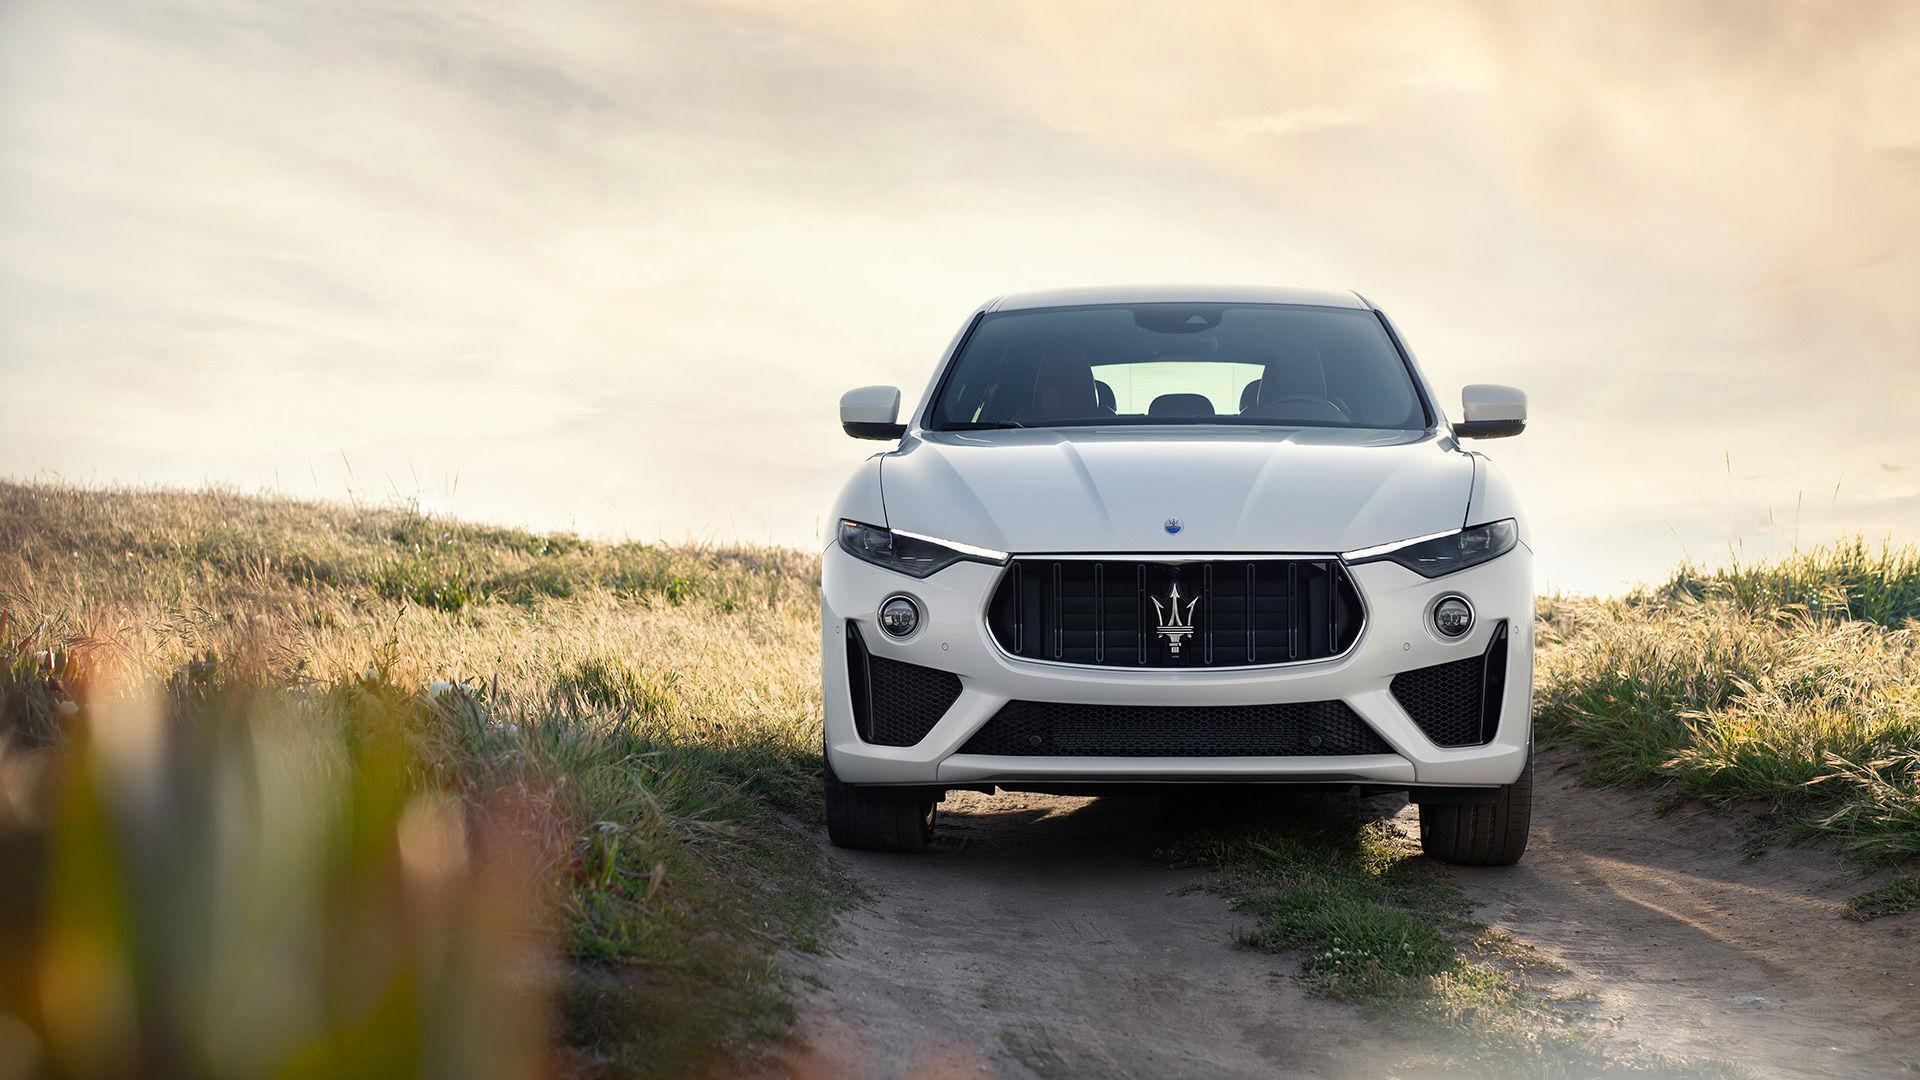 Maserati Levante VUS GTS - Bianco - Essai routier